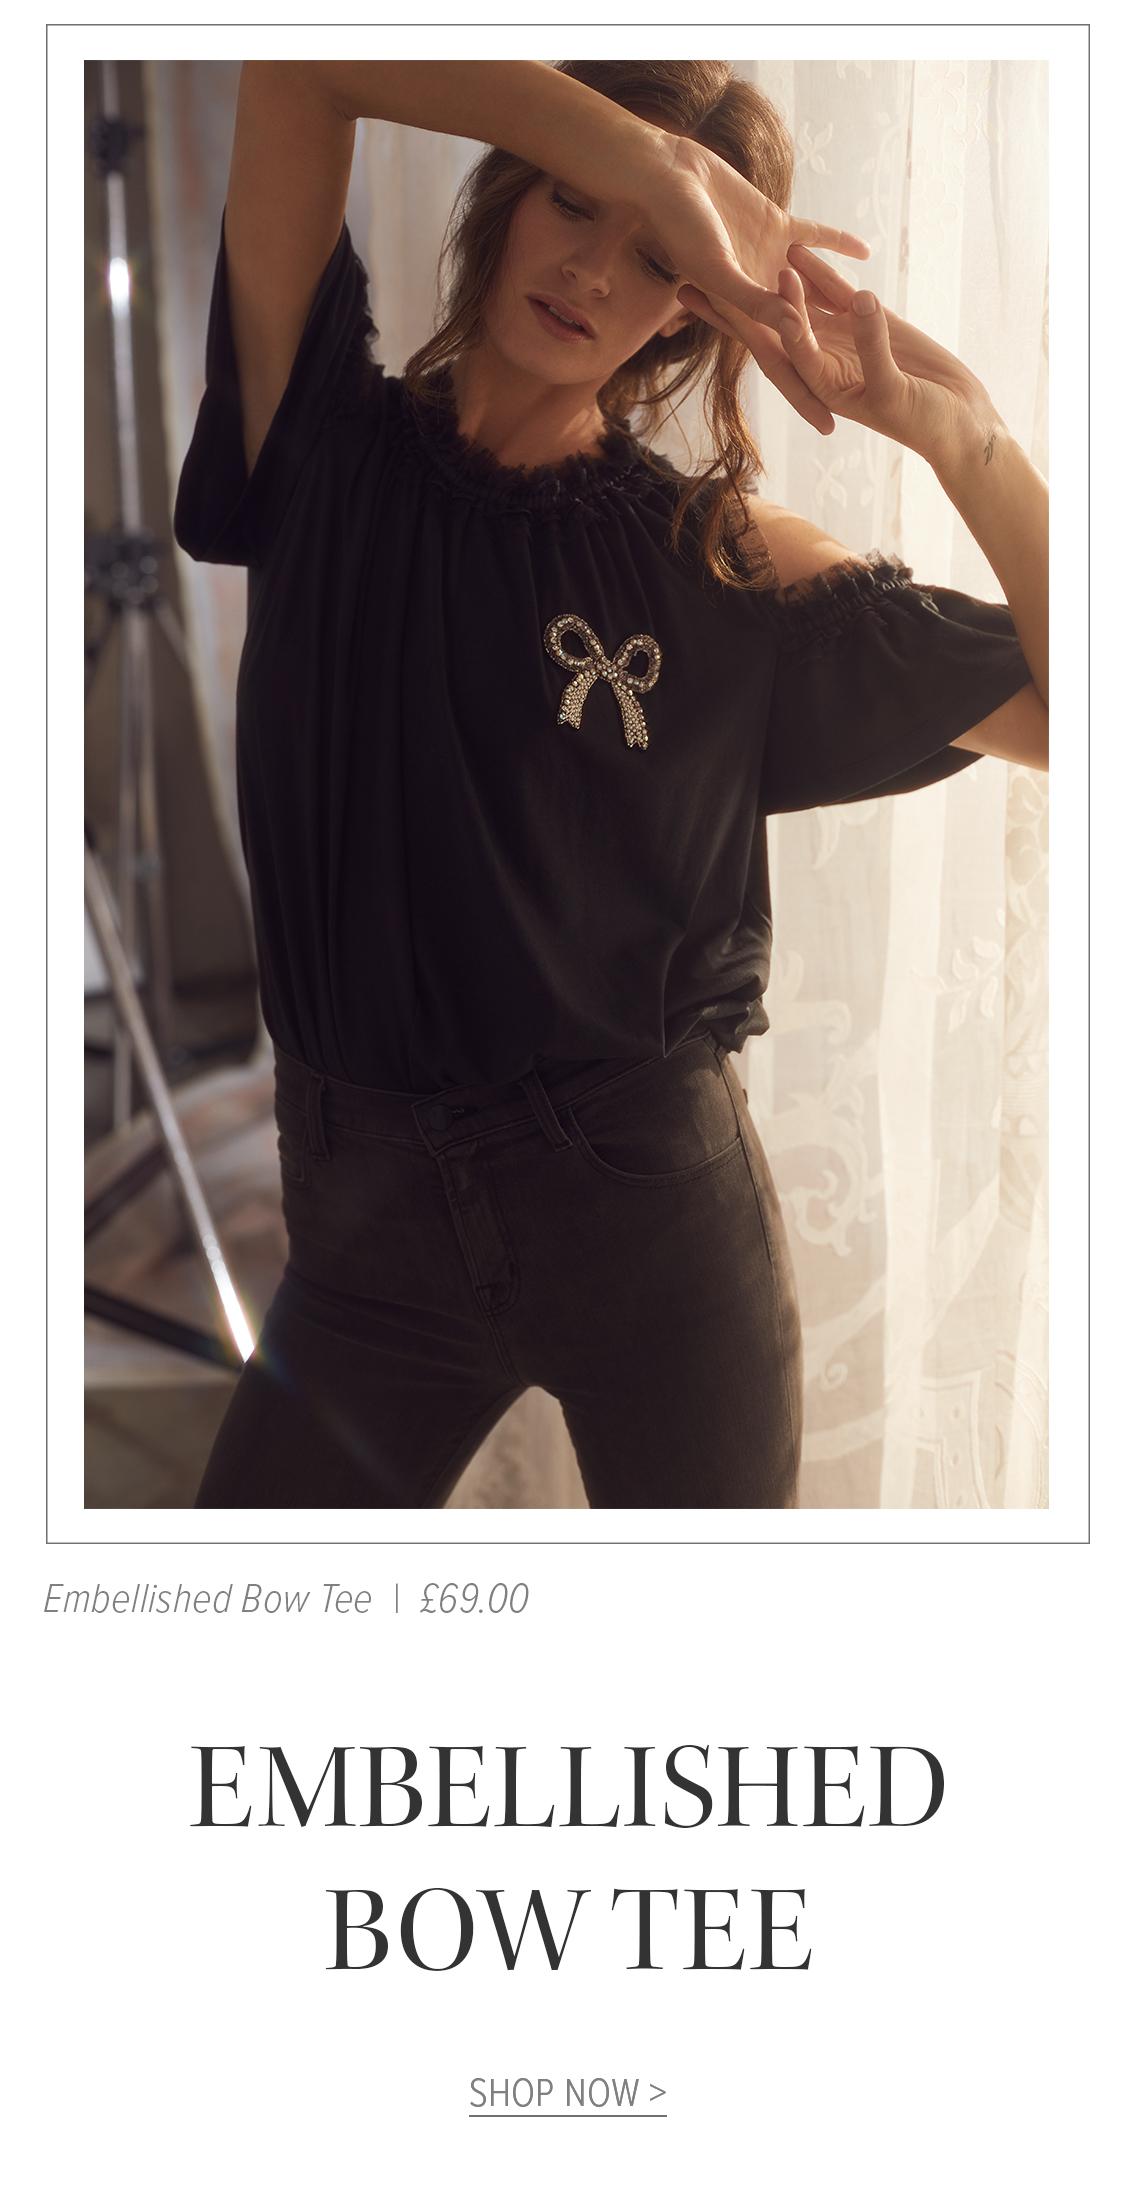 Embellished Bow Tee